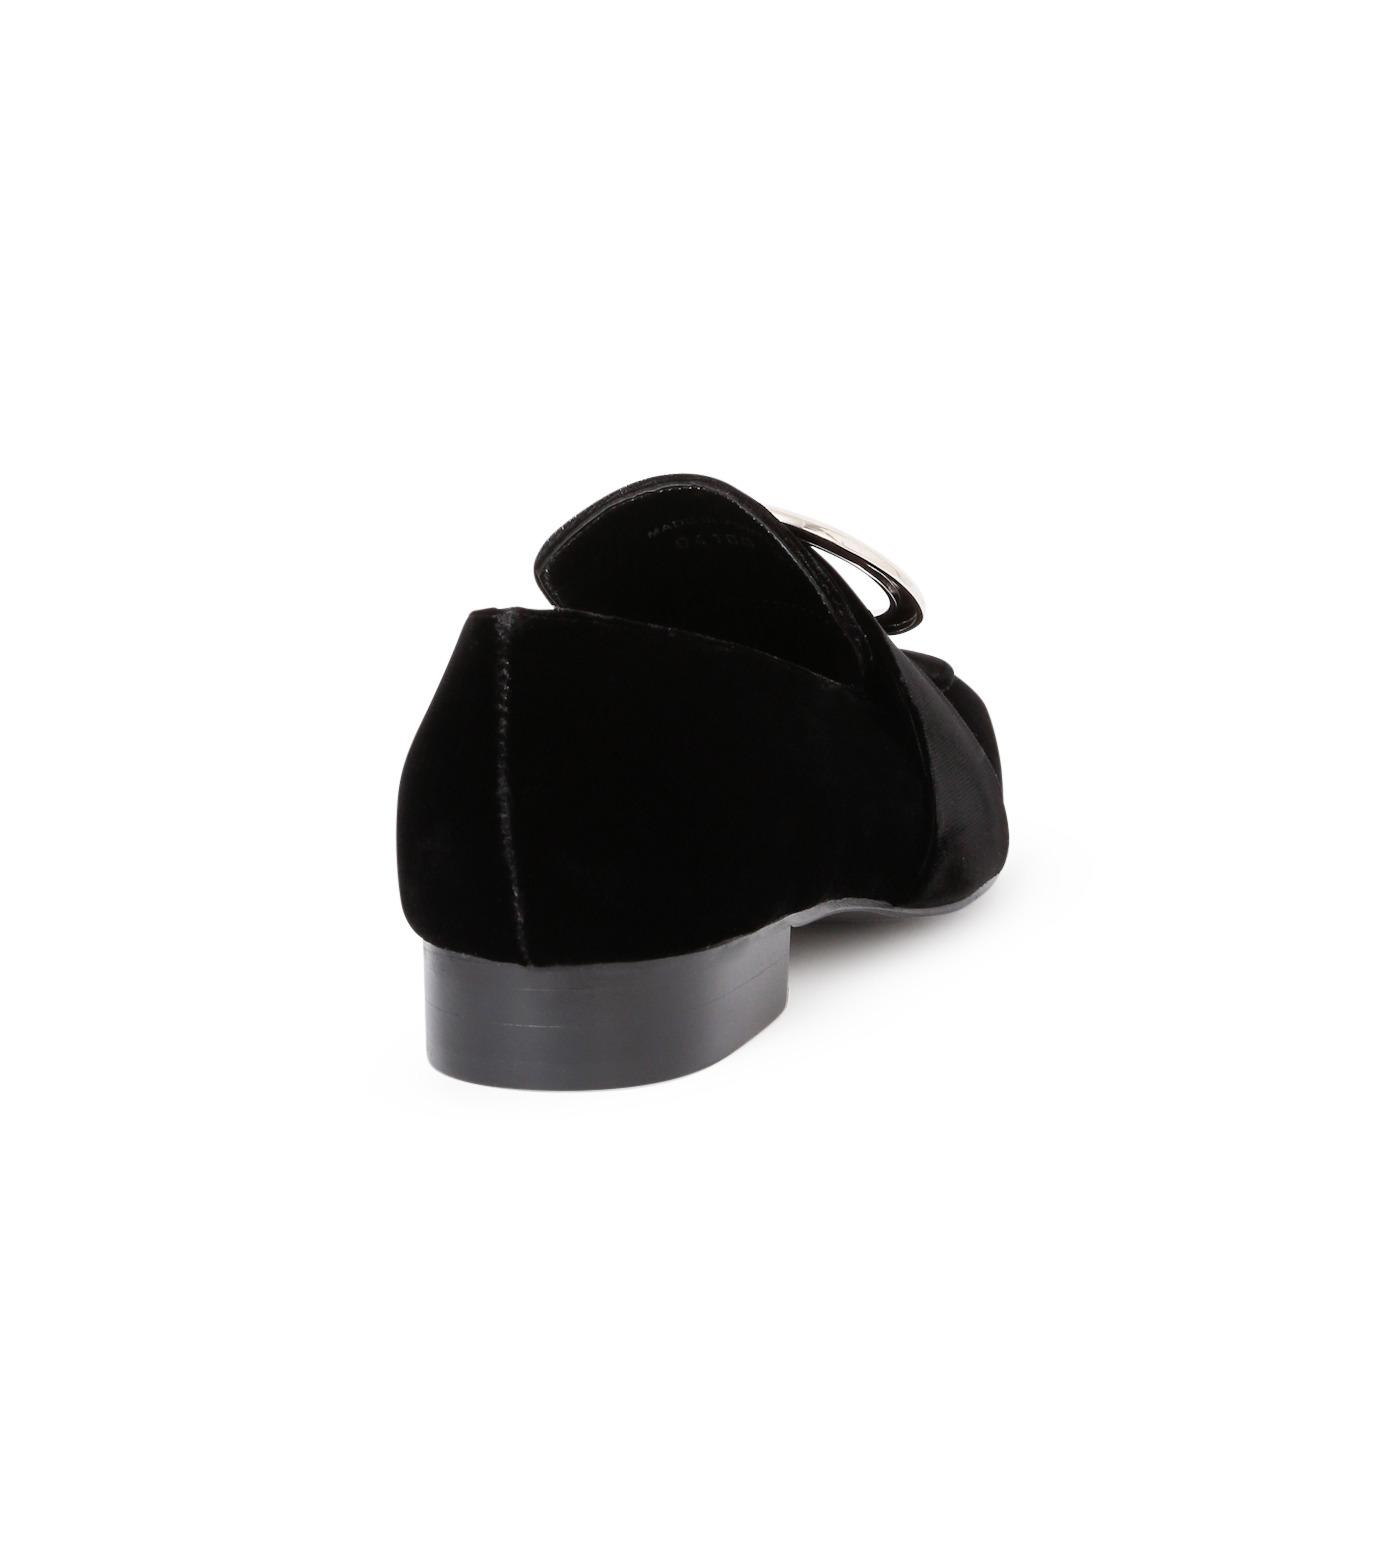 DORATEYMUR(ドラティムール)のRing Flat Shoes-BLACK(フラットシューズ/Flat shoes)-HARPUT-L-13 拡大詳細画像3